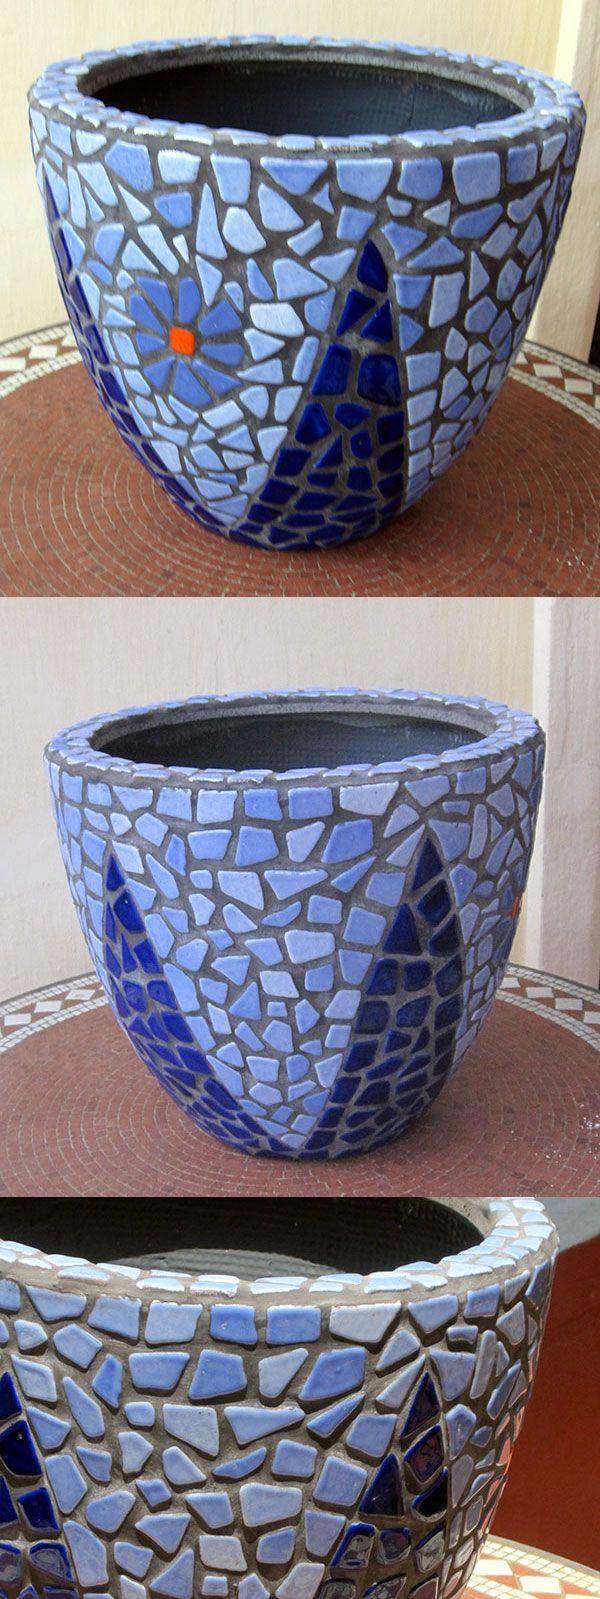 Small tiles for crafts - Small Mosaic Tiles For Crafts Diy Mosaic Blue Flower Pot Mosaik Blumentopf Mosaique Pot De Download